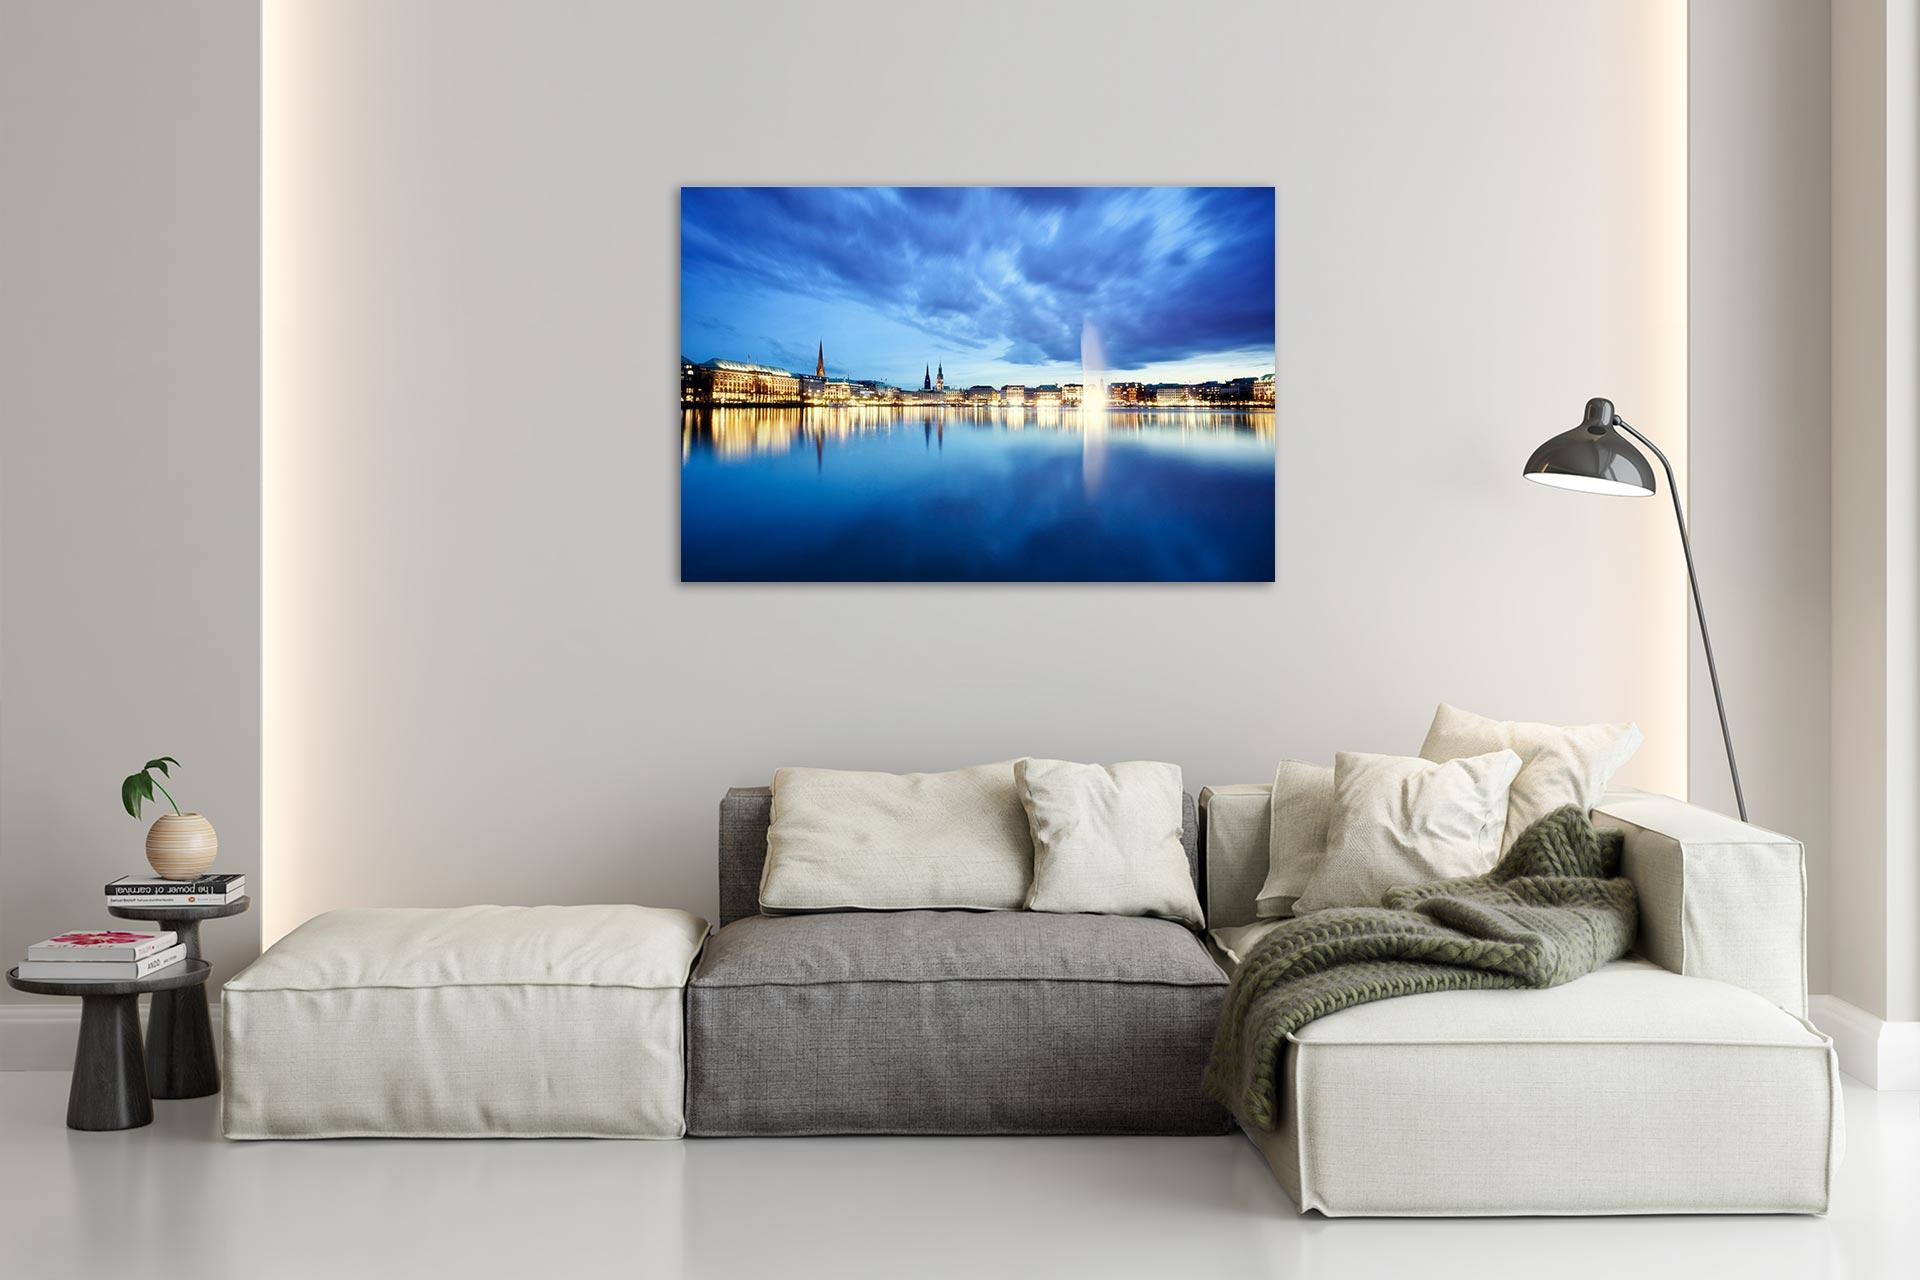 TG043-binnenalster-wandbild-bild-auf-leinwand-acrylglas-aludibond-wohnzimmer